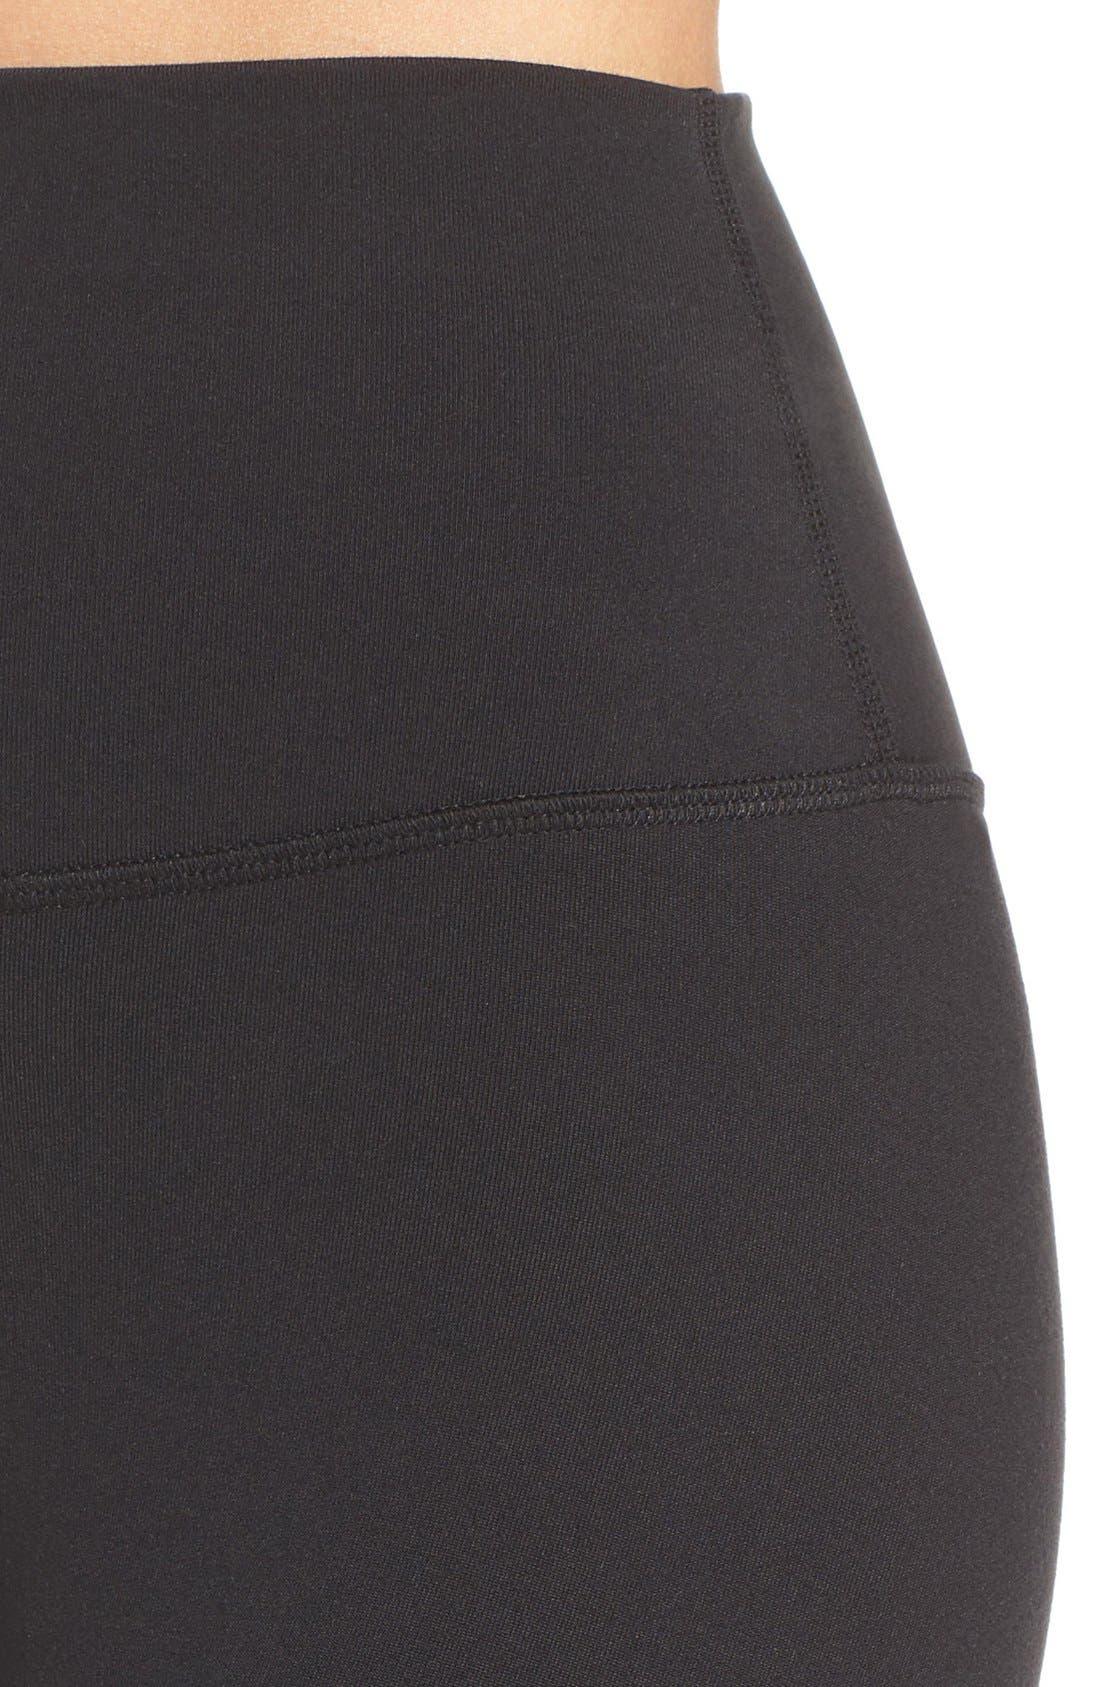 ALO, Airbrush High Waist Leggings, Alternate thumbnail 7, color, BLACK